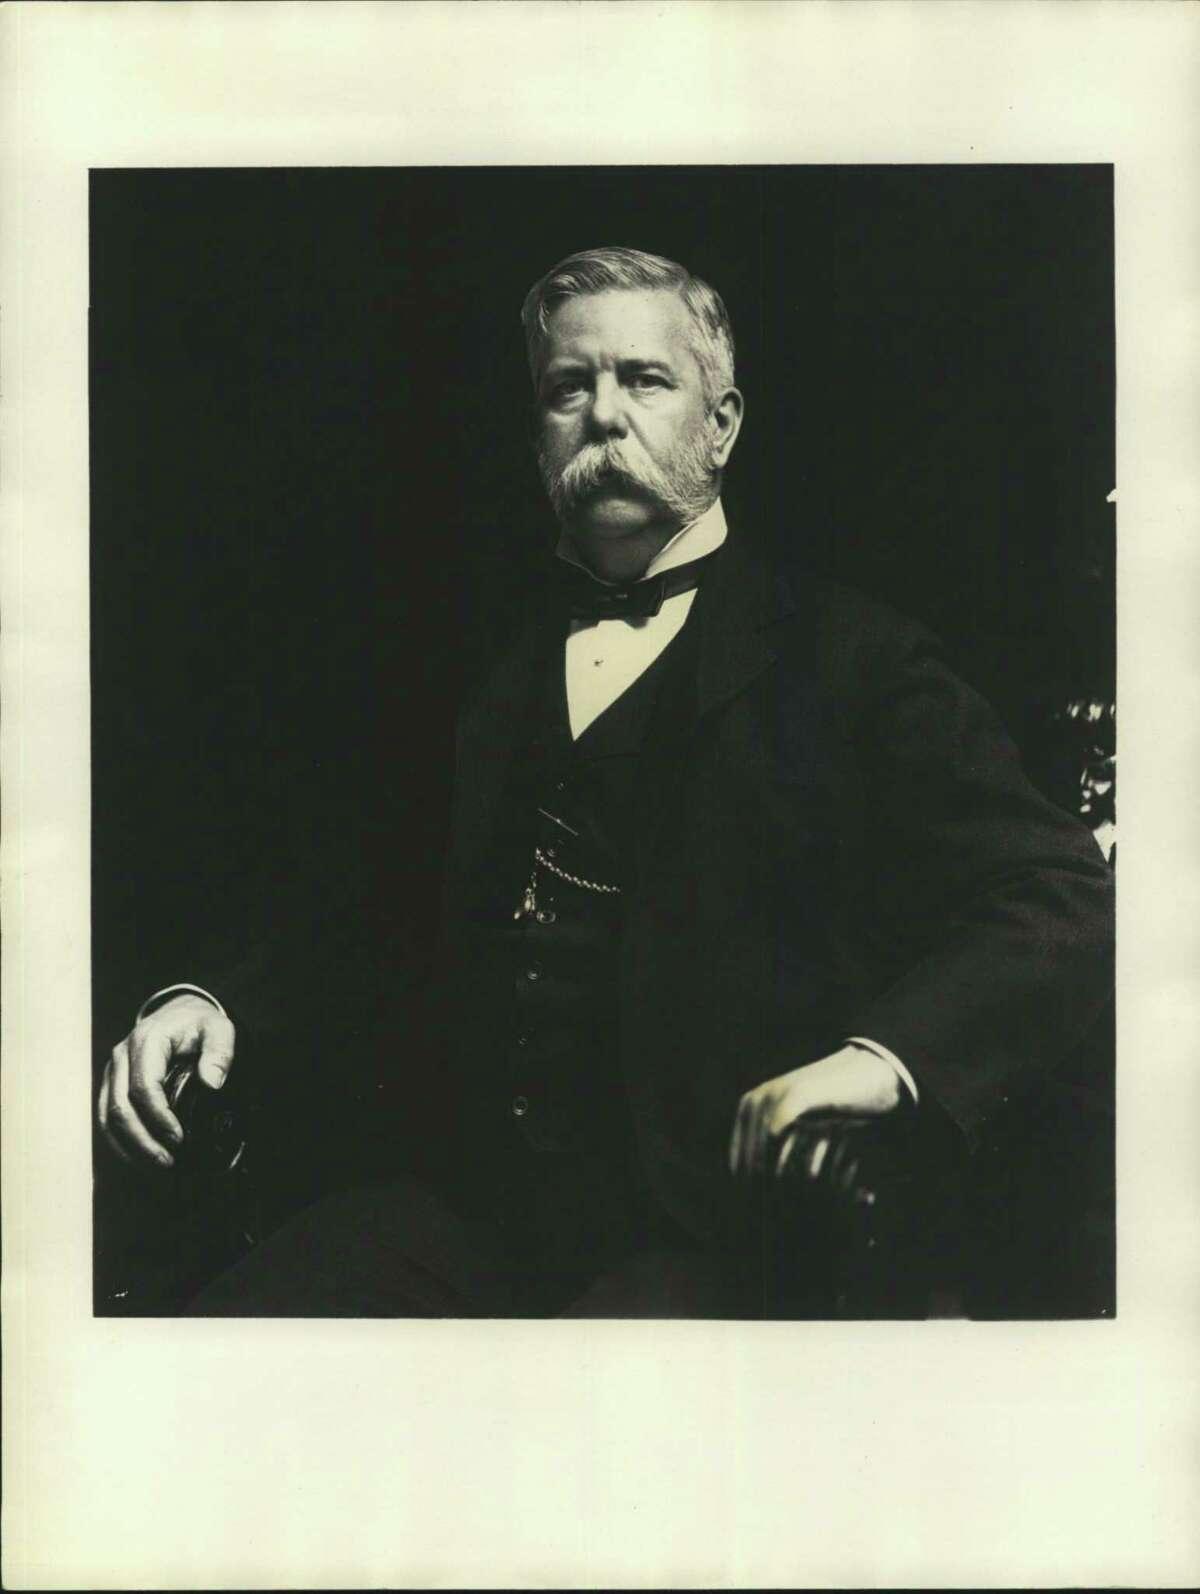 Westinghouse, George. Entrepreneur George Westinghouse in black suit and ribbon tie.